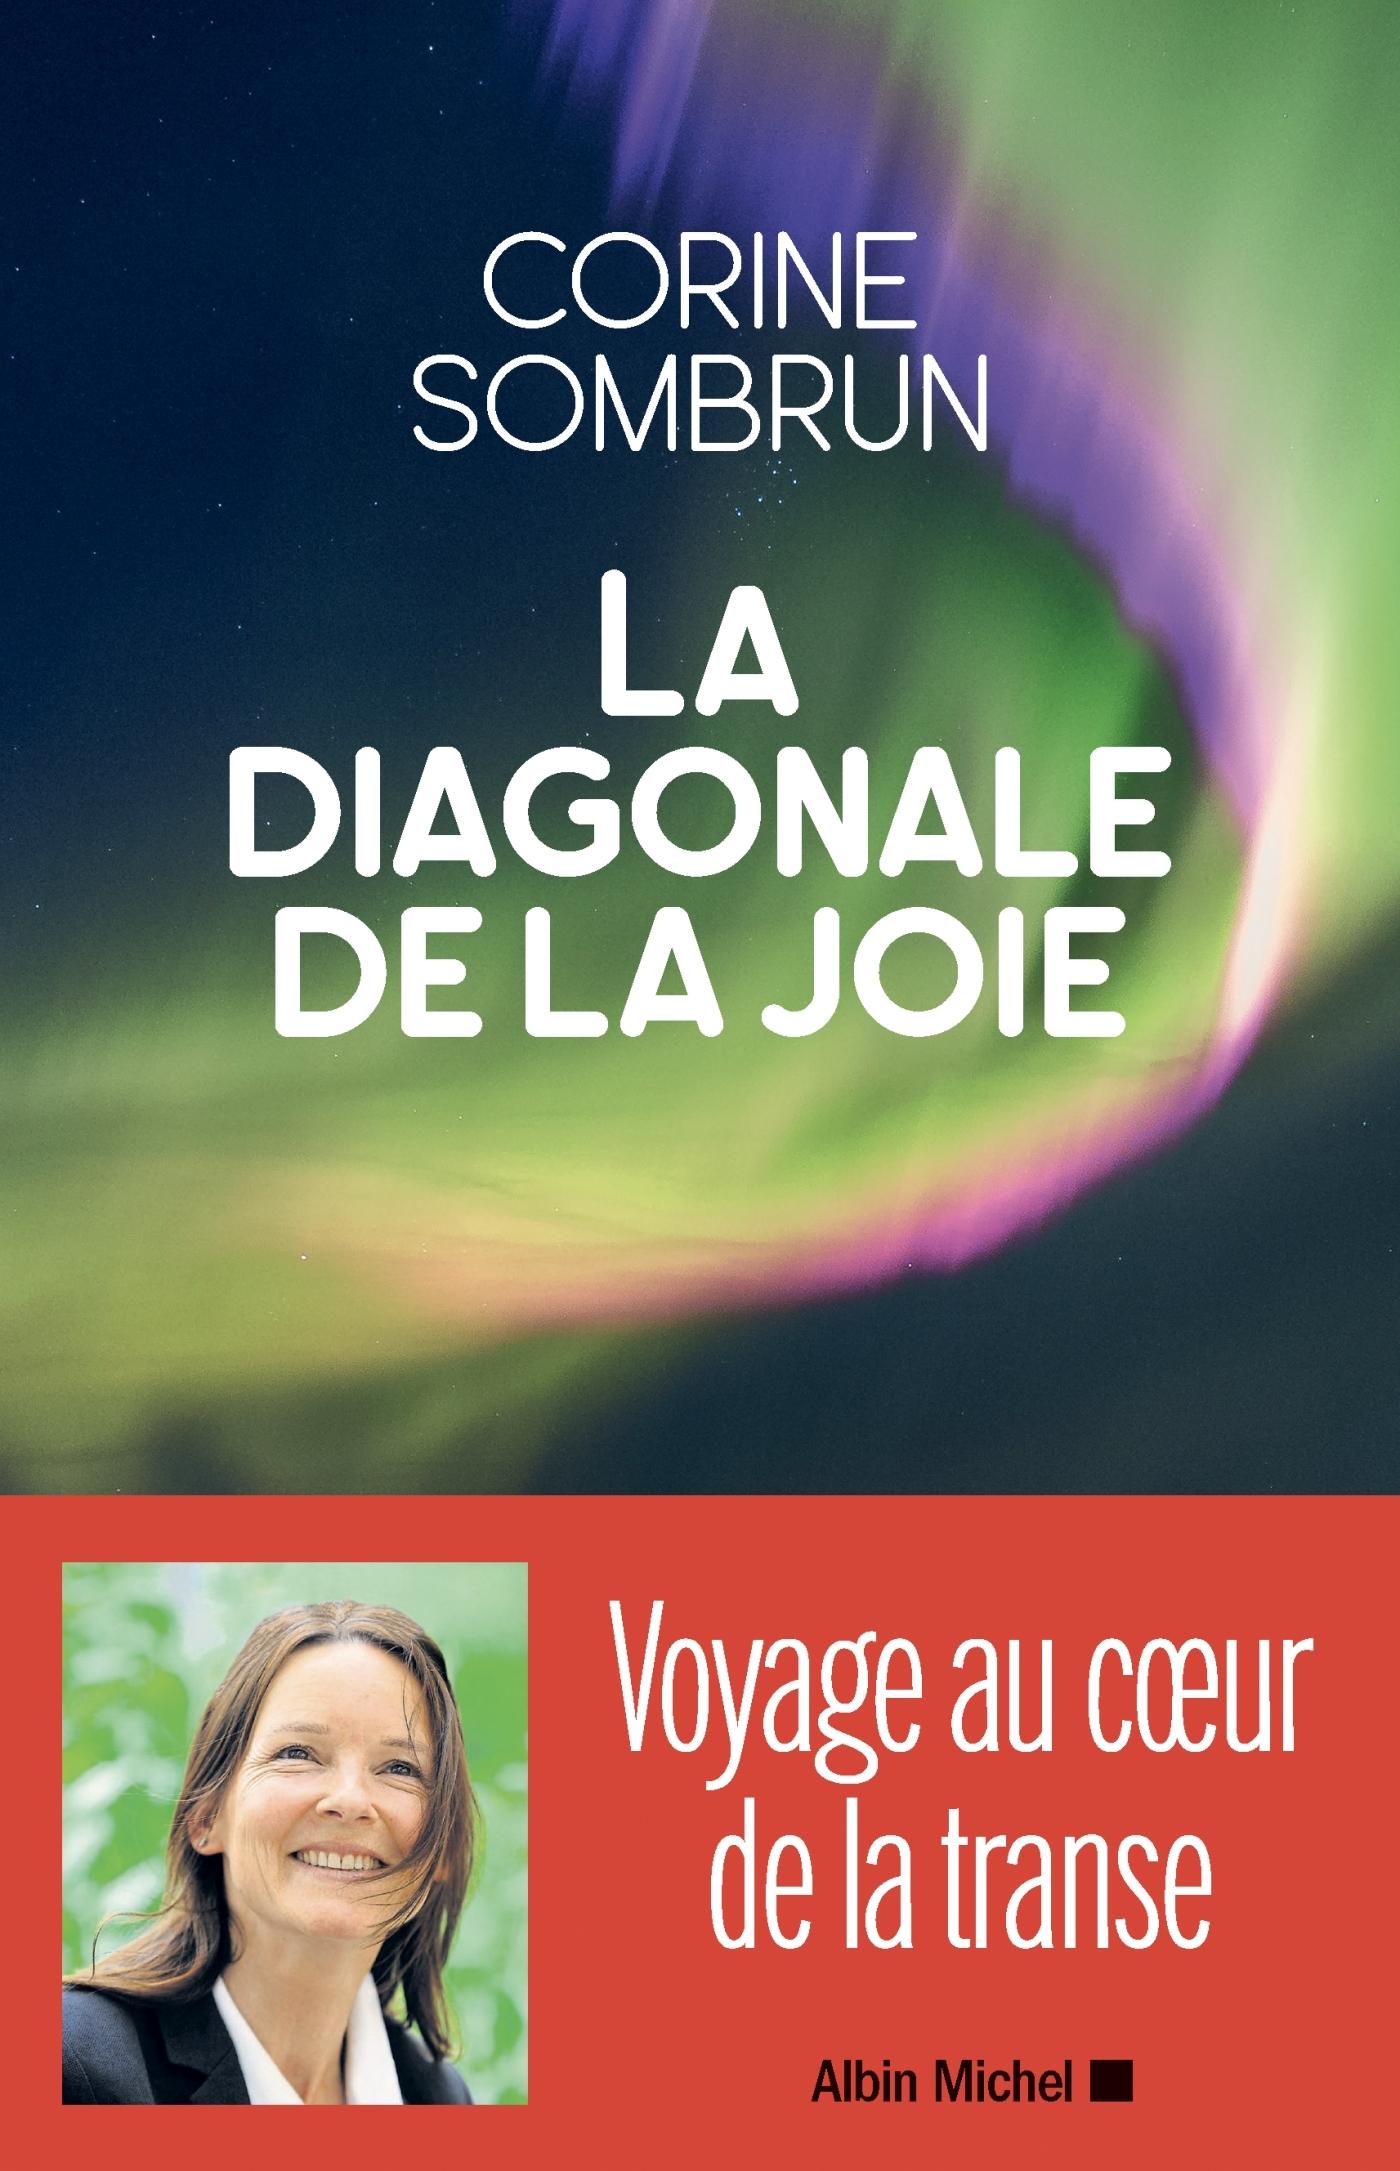 LA DIAGONALE DE LA JOIE - VOYAGE AU COEUR DE LA TRANSE